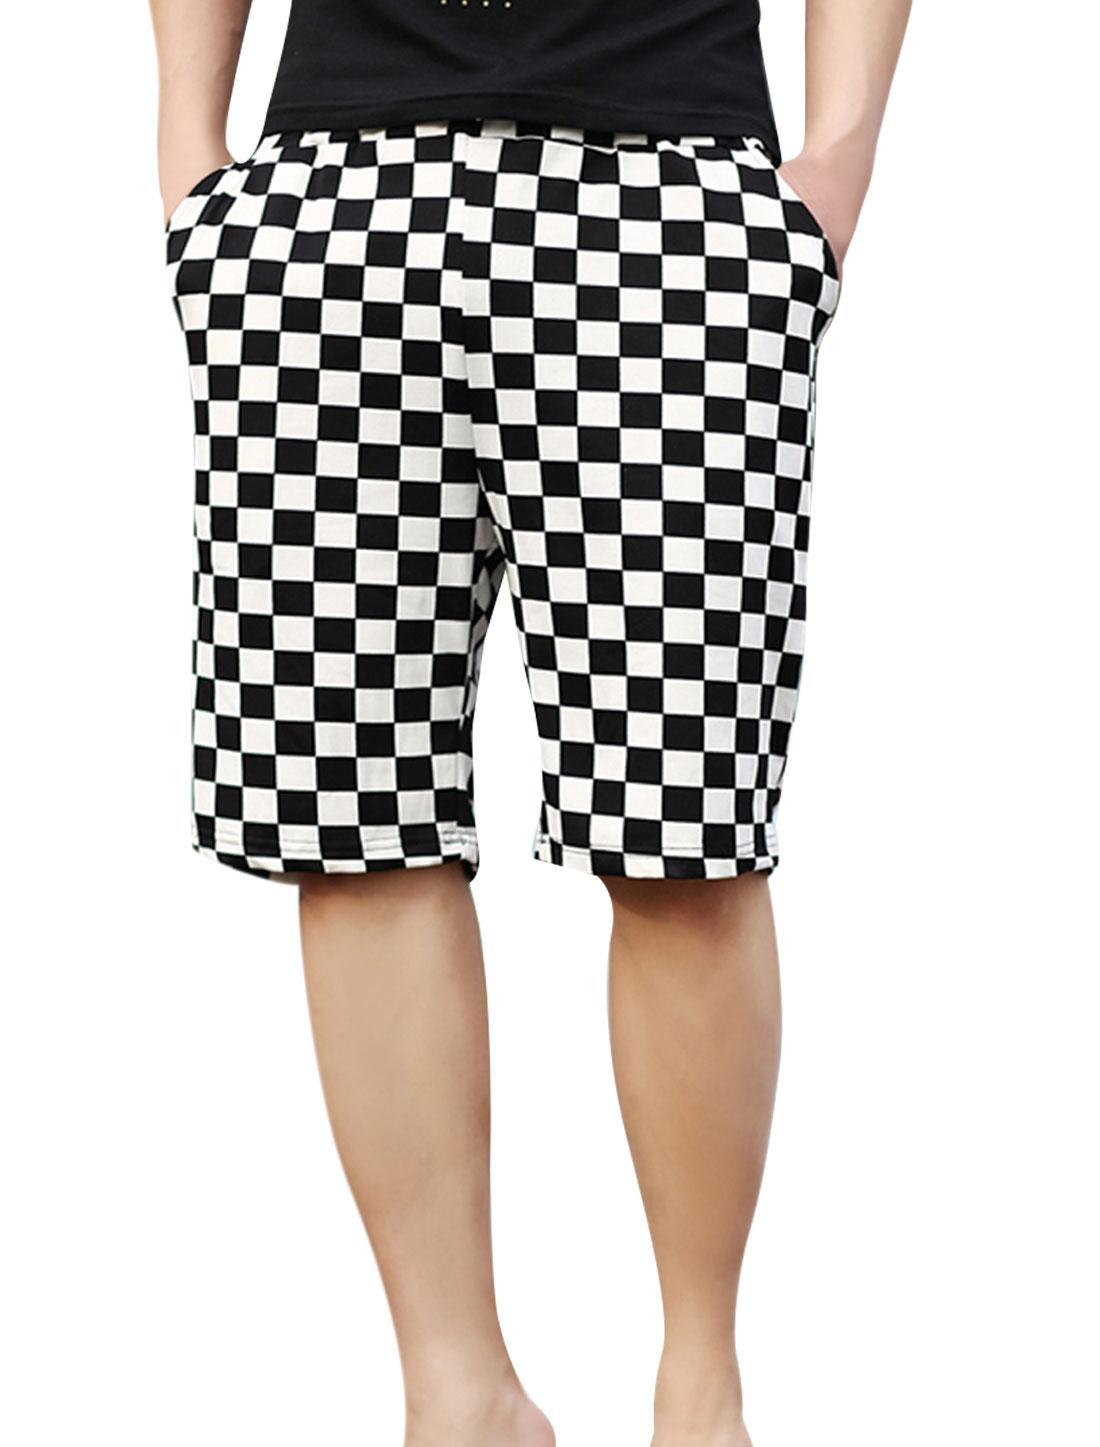 Men Plaids Pattern Decor Elastic Waist Black White Shorts XS